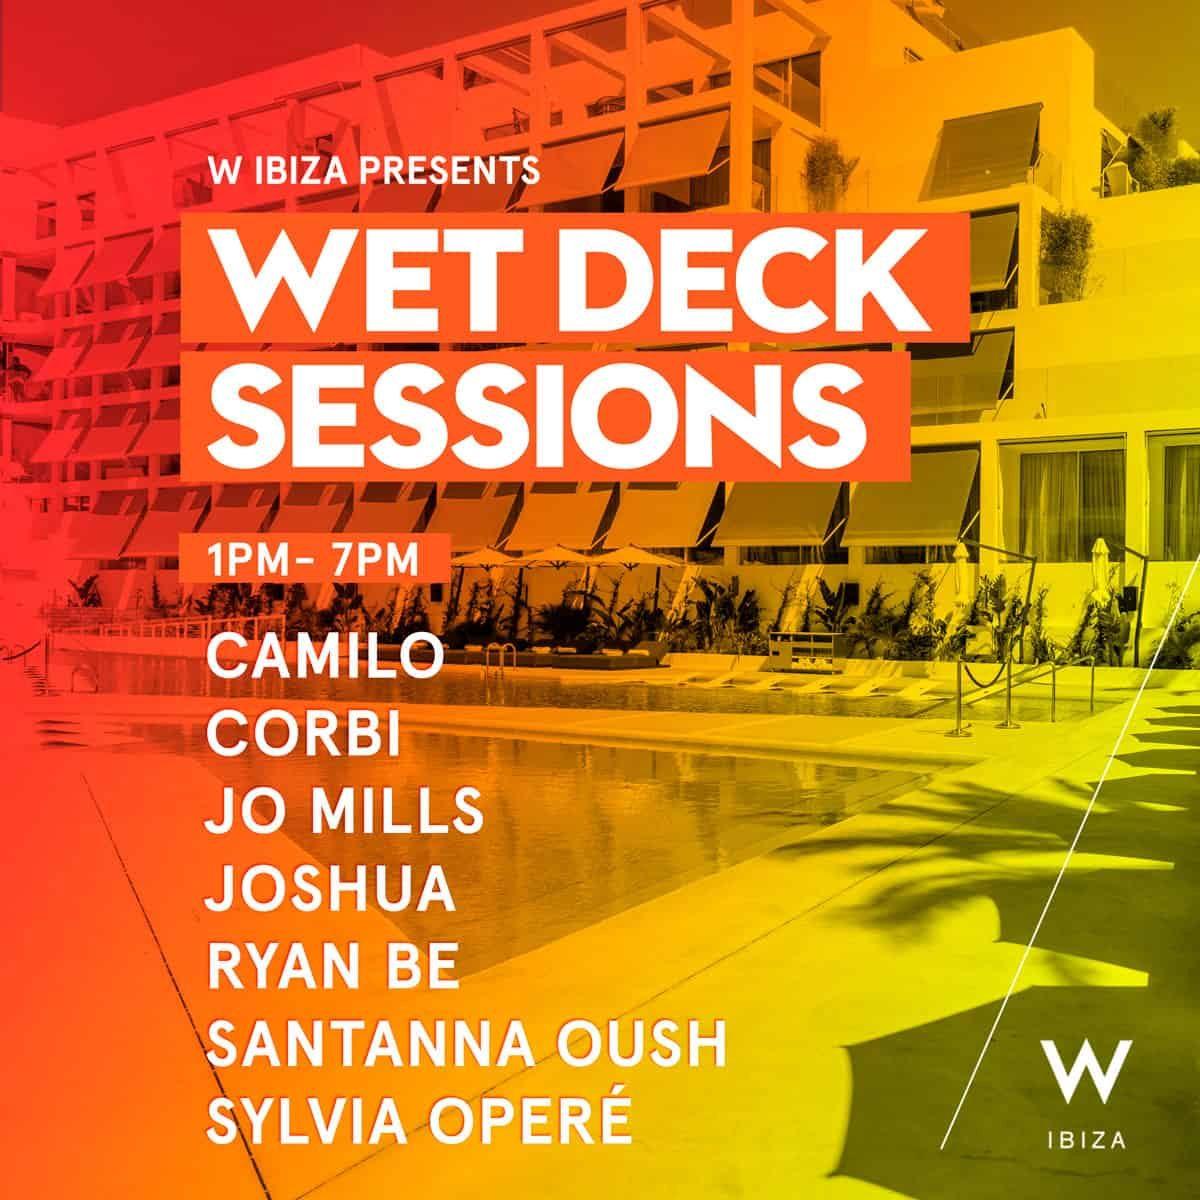 wet-deck-sessions-w-ibiza-2021-welcometoibiza